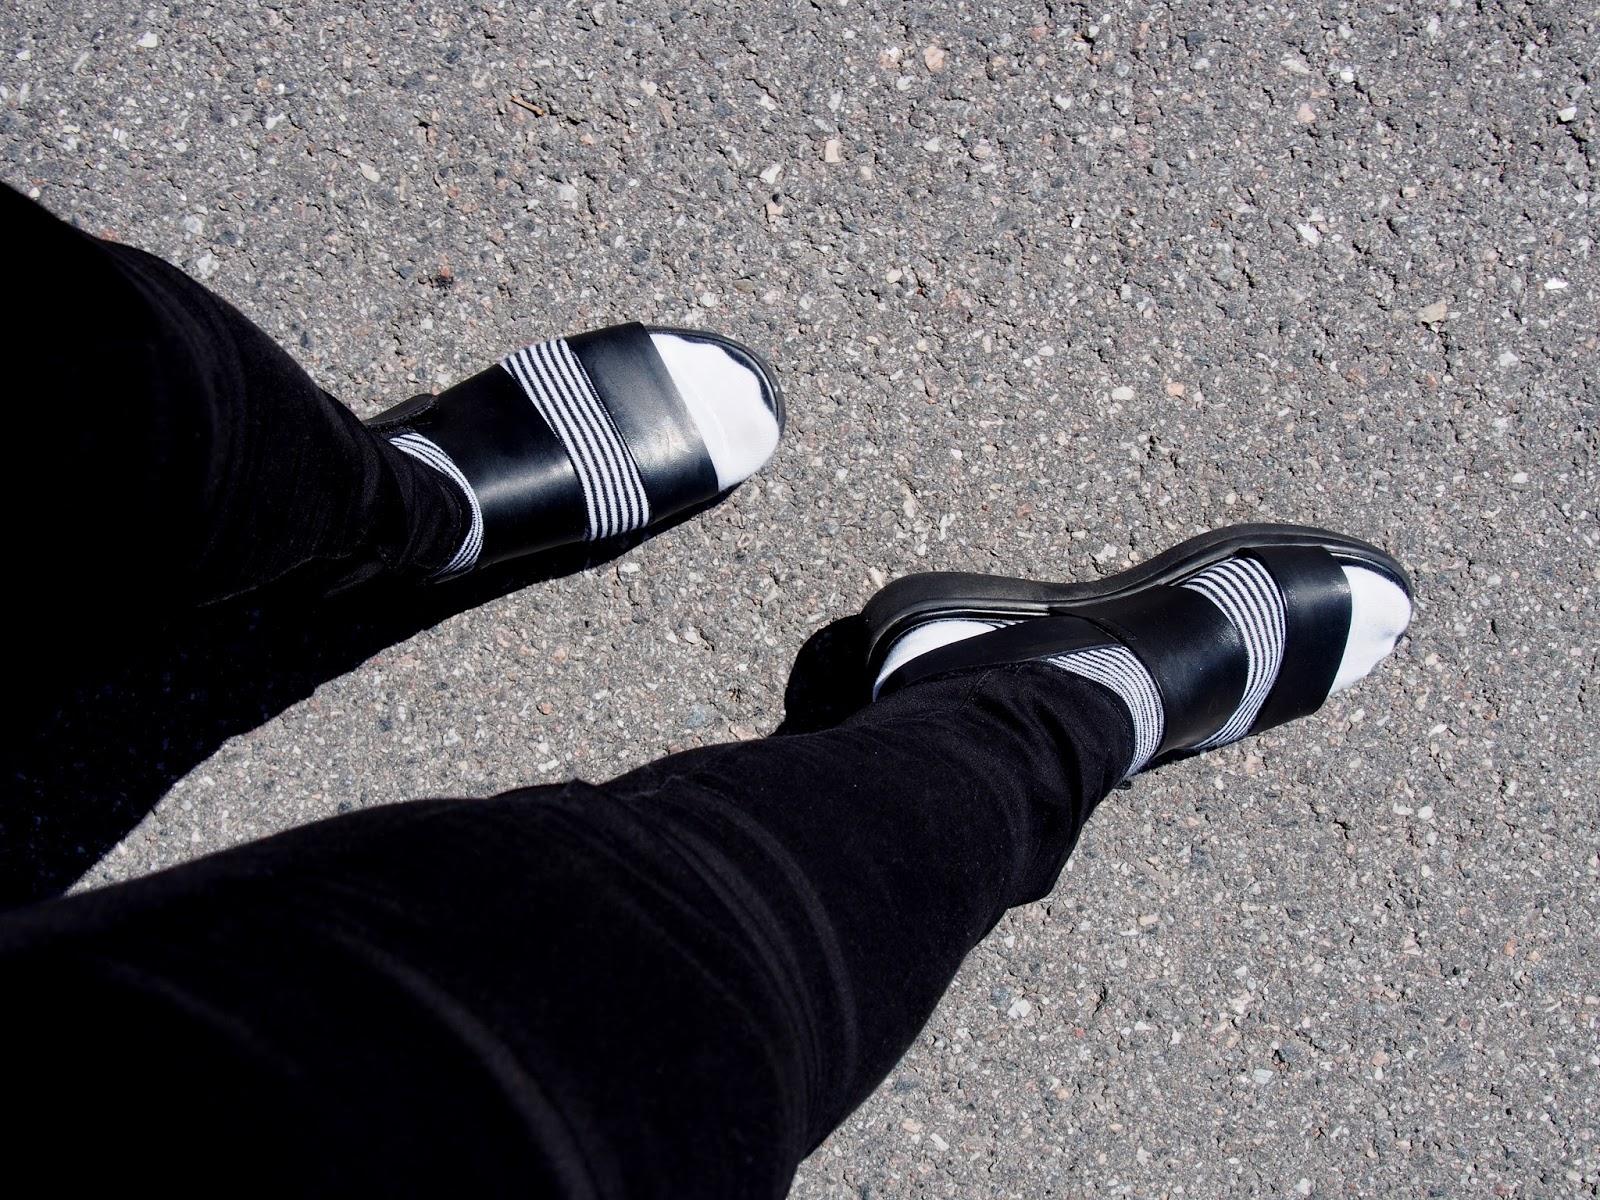 vagabond sock sock sandals shoes sandal black style white classic stripe sripes trousers jeans